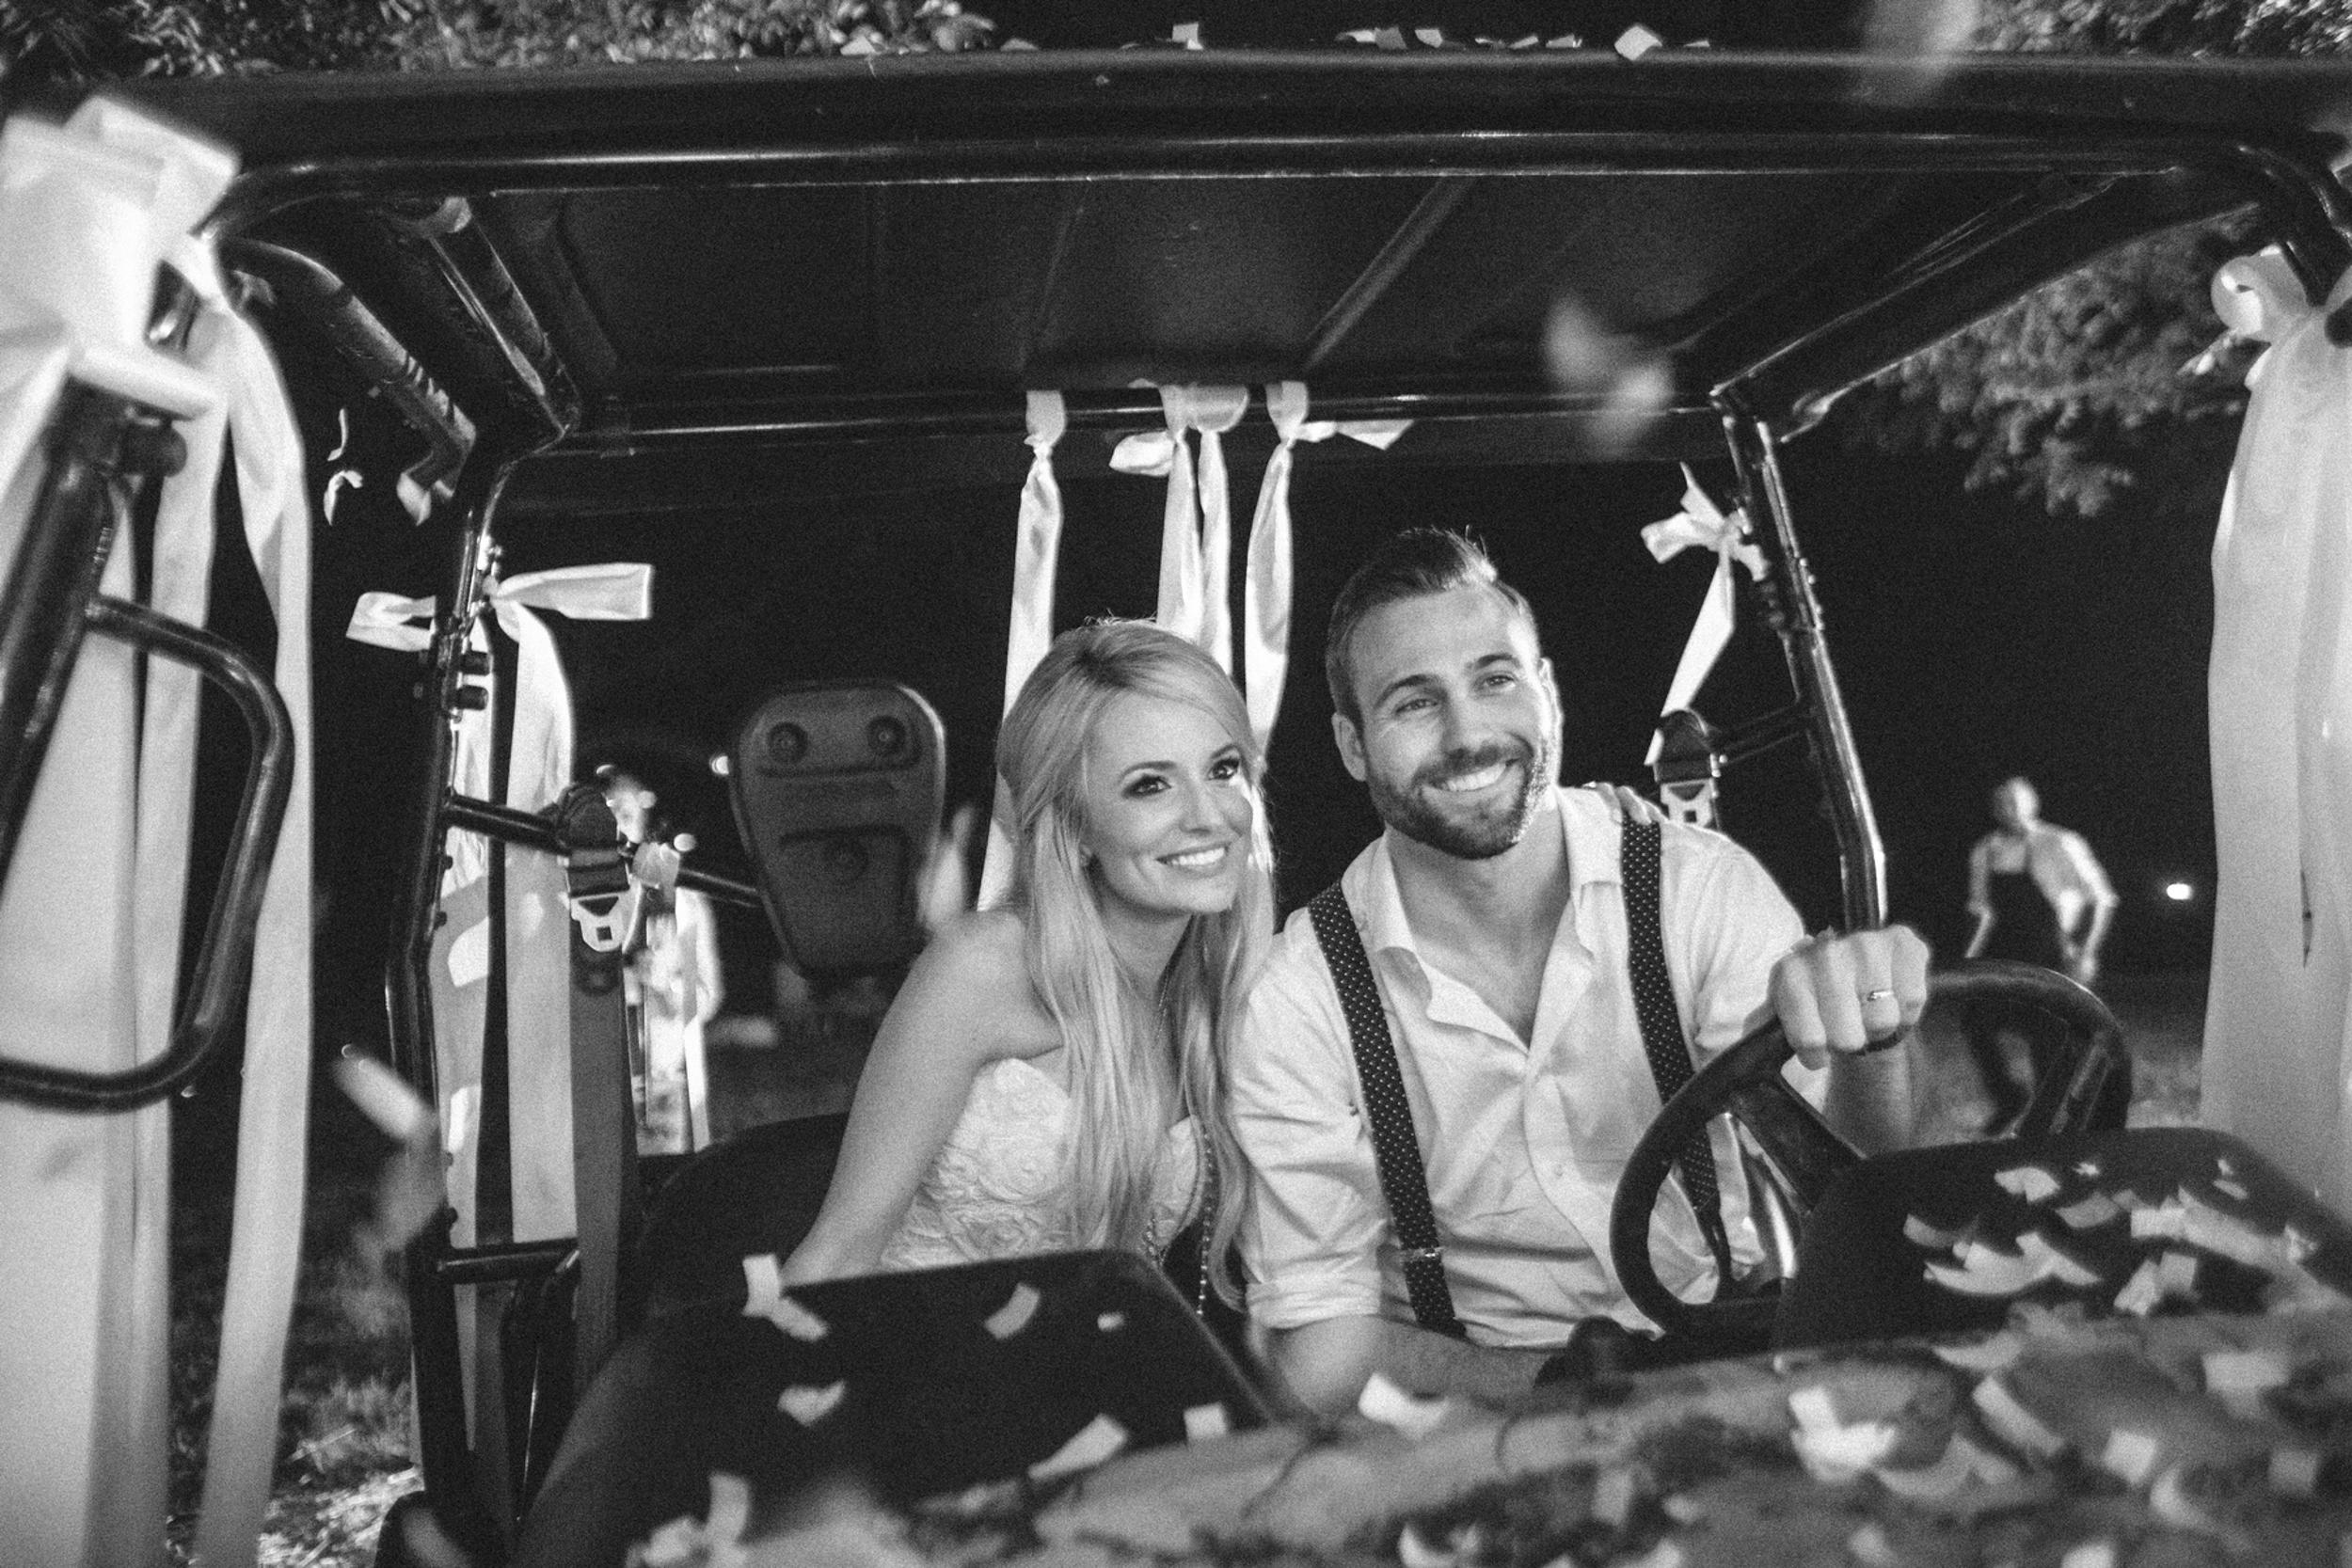 south_carolina_farm_wedding_rustic_chic_surprise_secret_luxe_wedding_bachelorette_emily_maynard_real_weddings-42.jpg